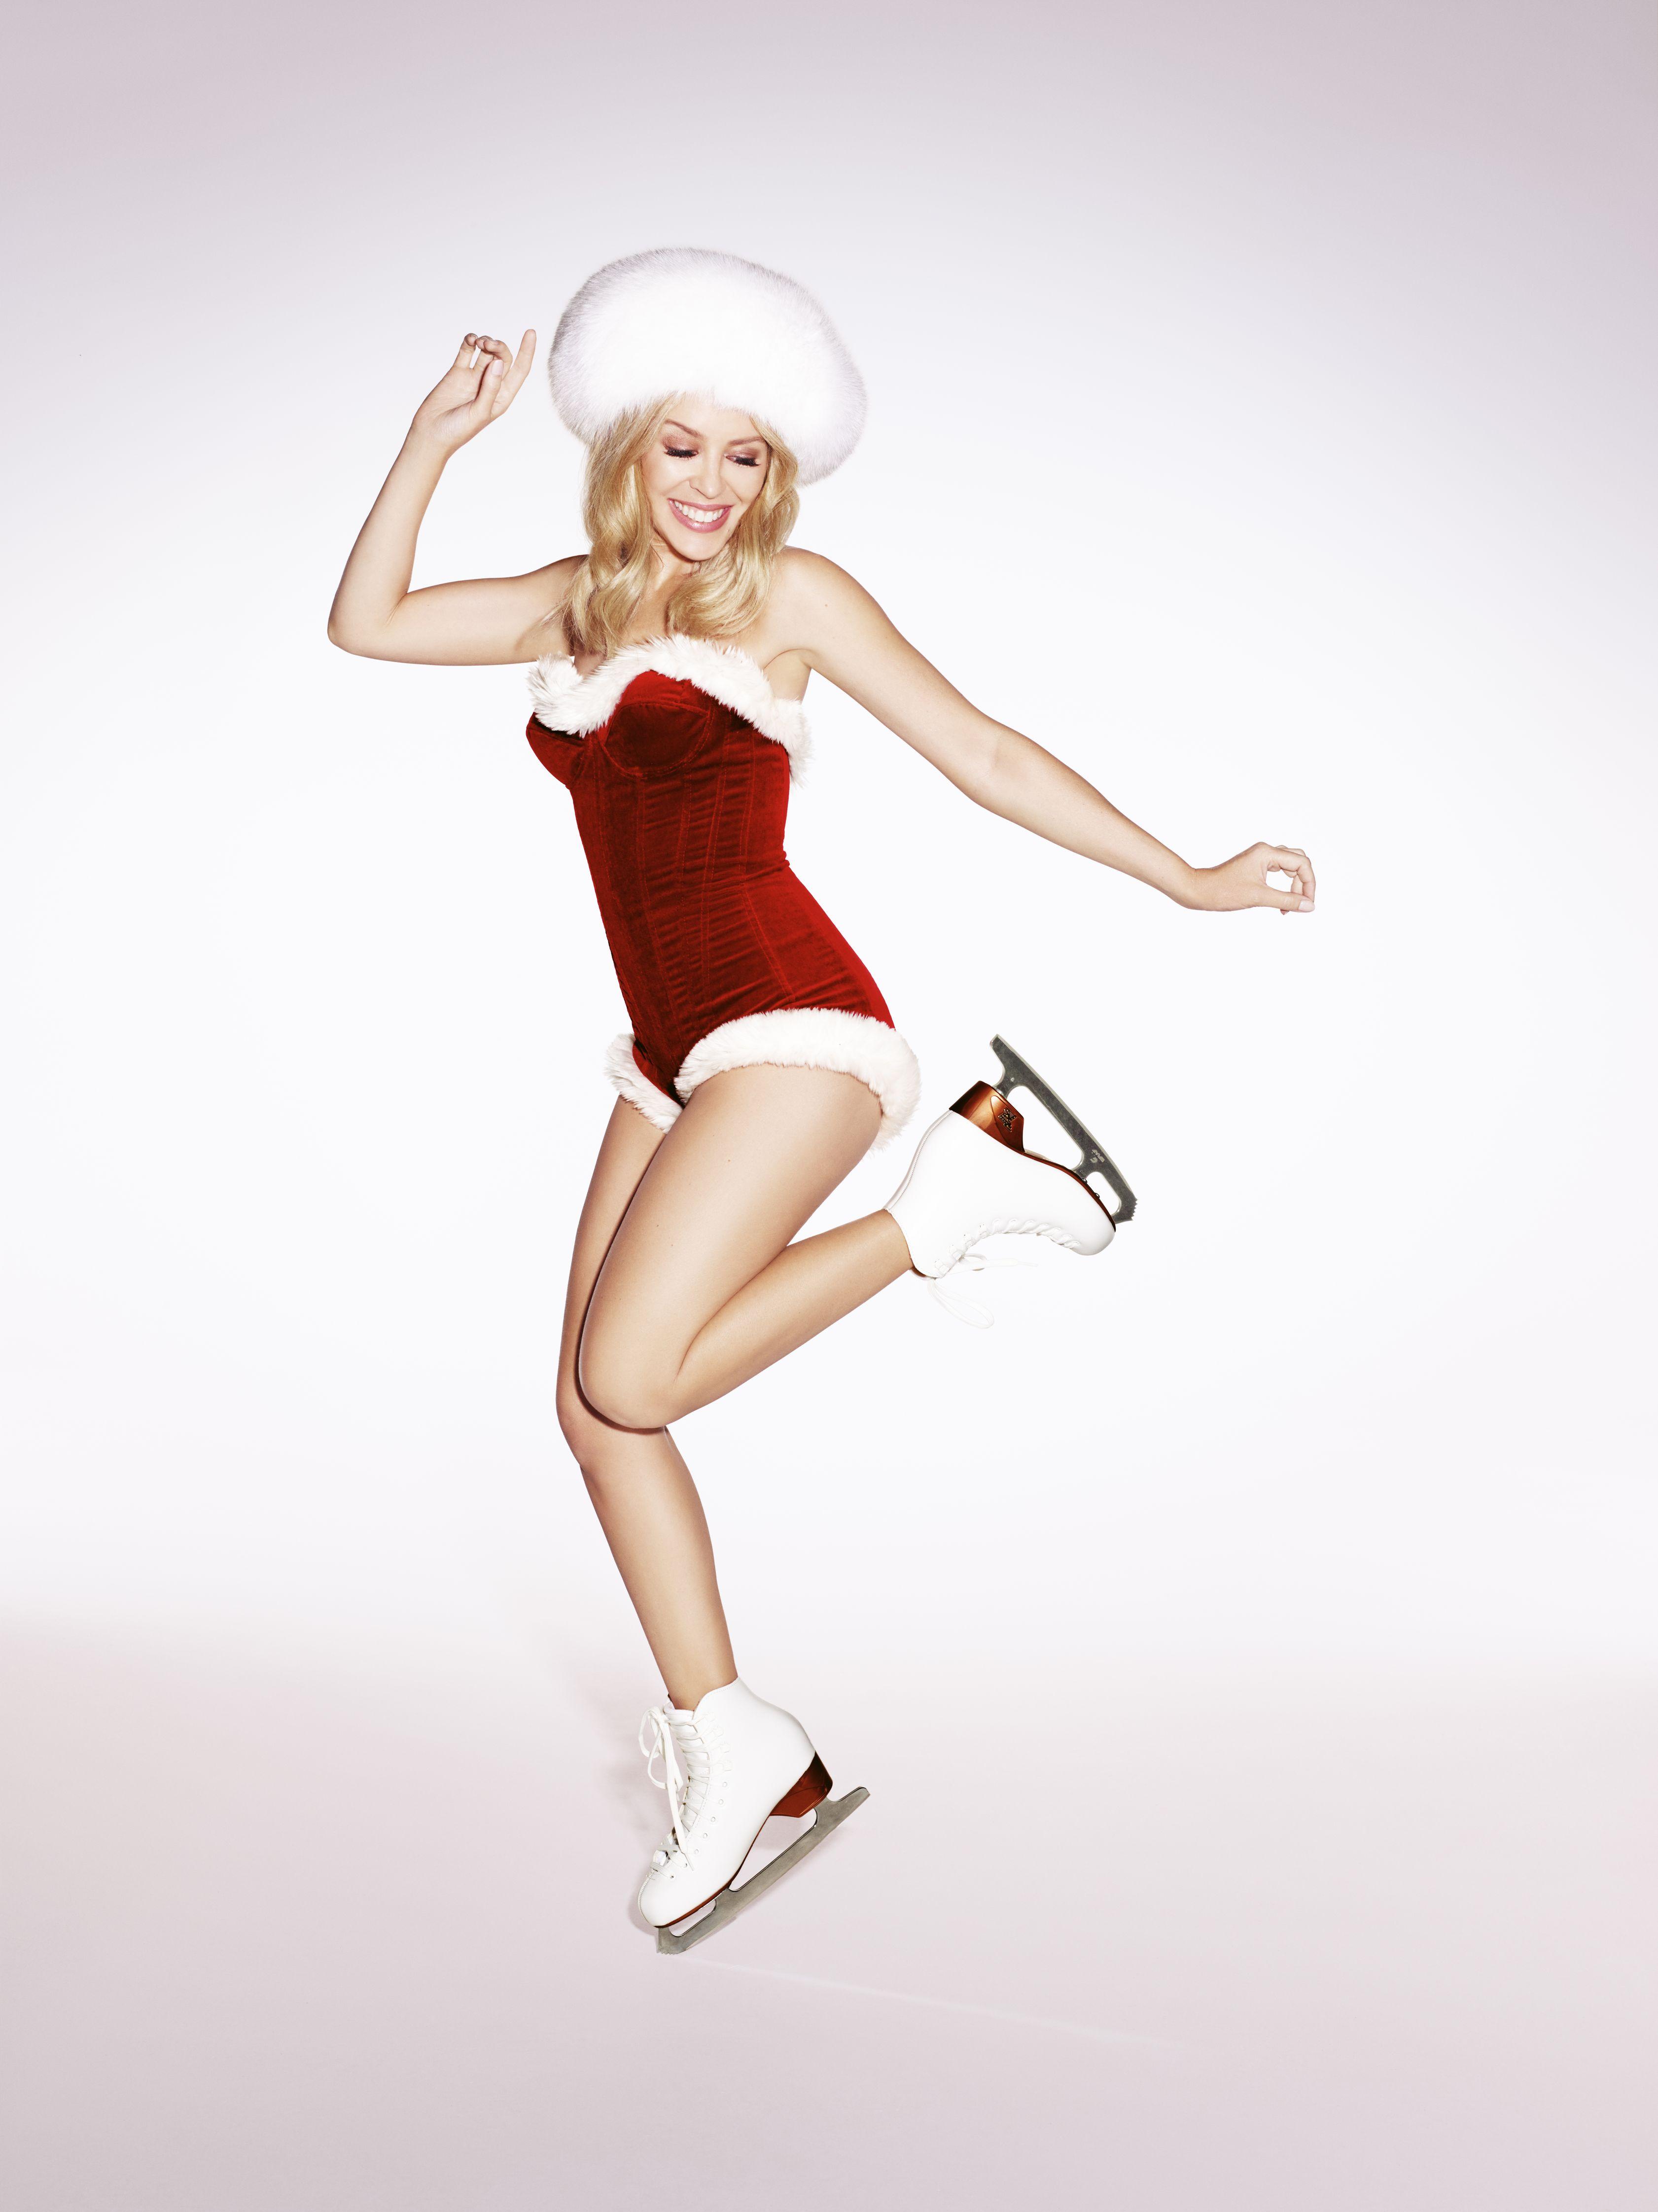 Kylie-Minogue-Sexy-4